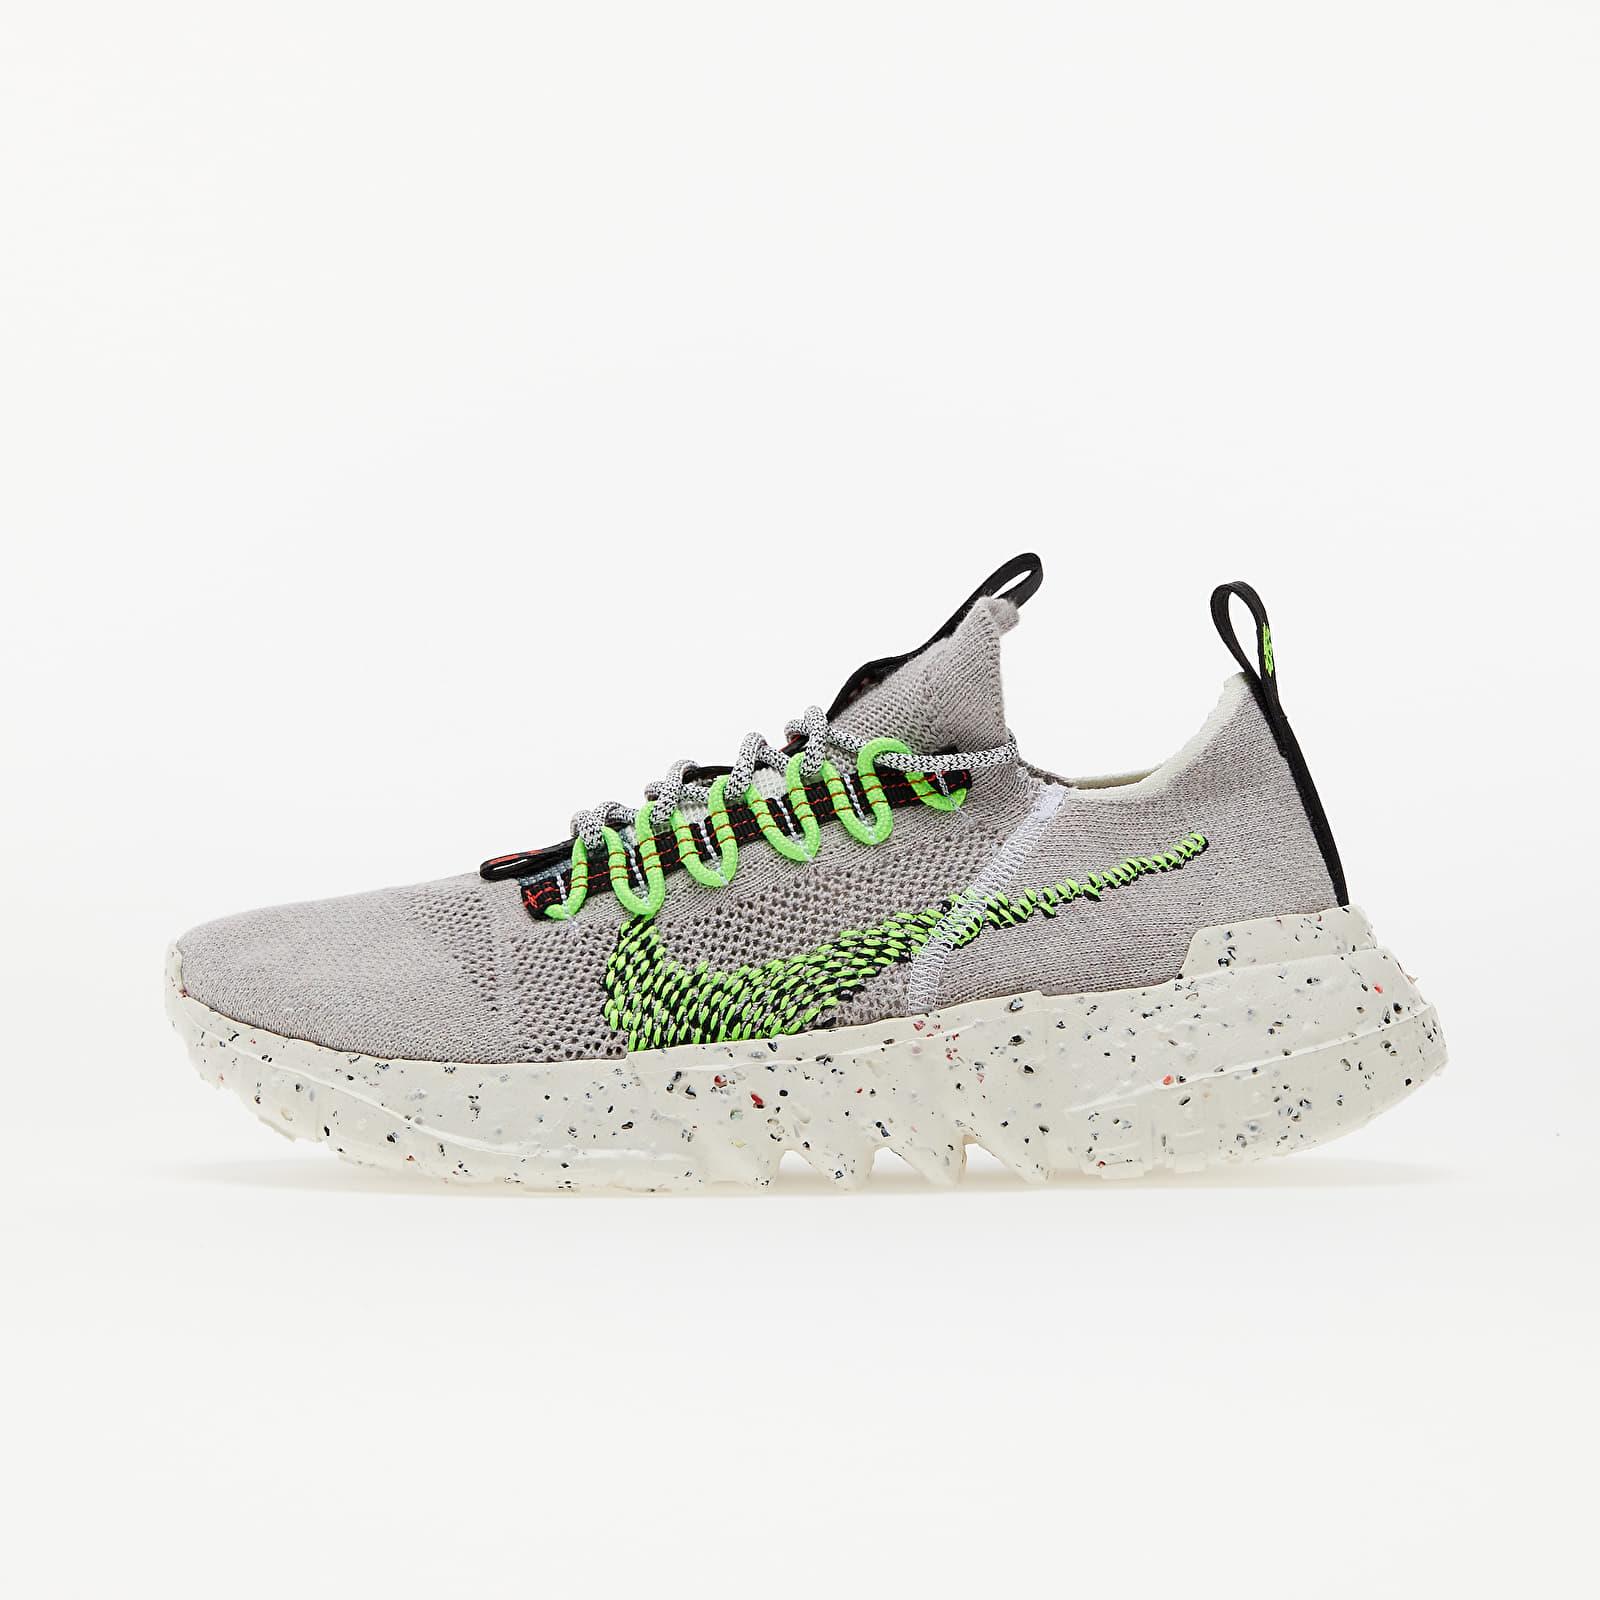 Nike Space Hippie 01 Vast Grey/ Electric Green-Black-White